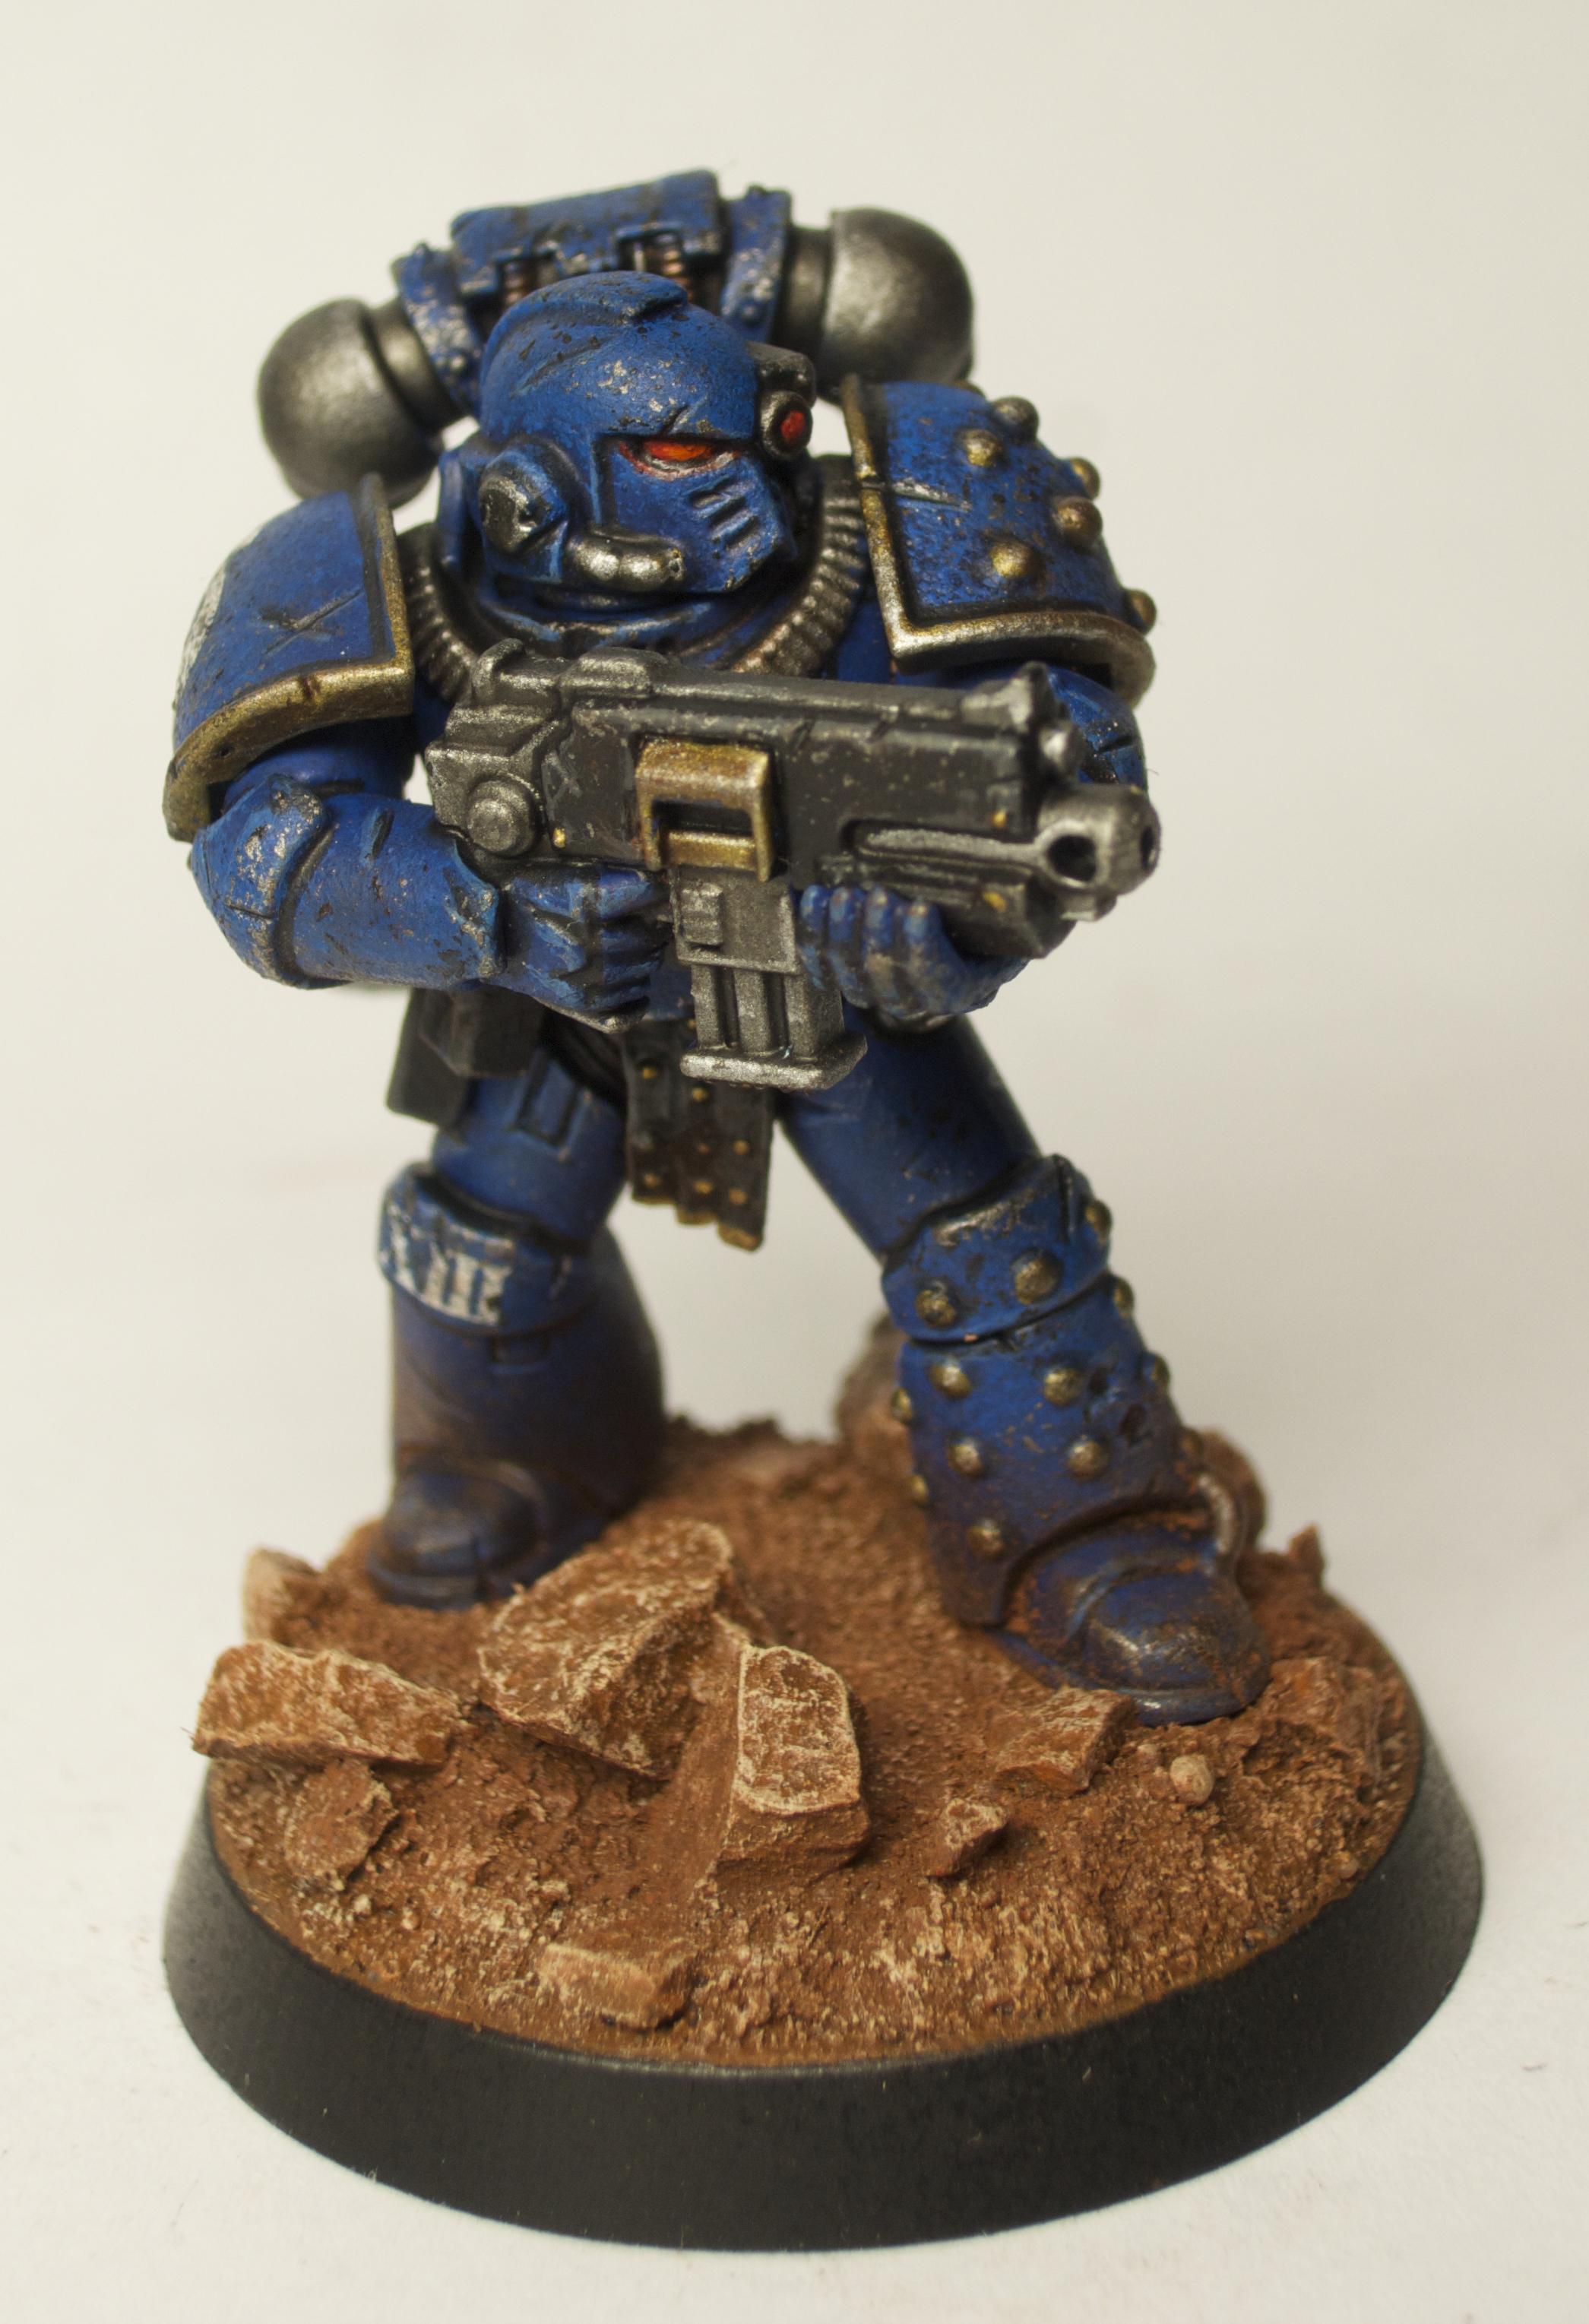 30k, Forge World, Heresy, Legion, Space Marines, Ultramarines, Weathered